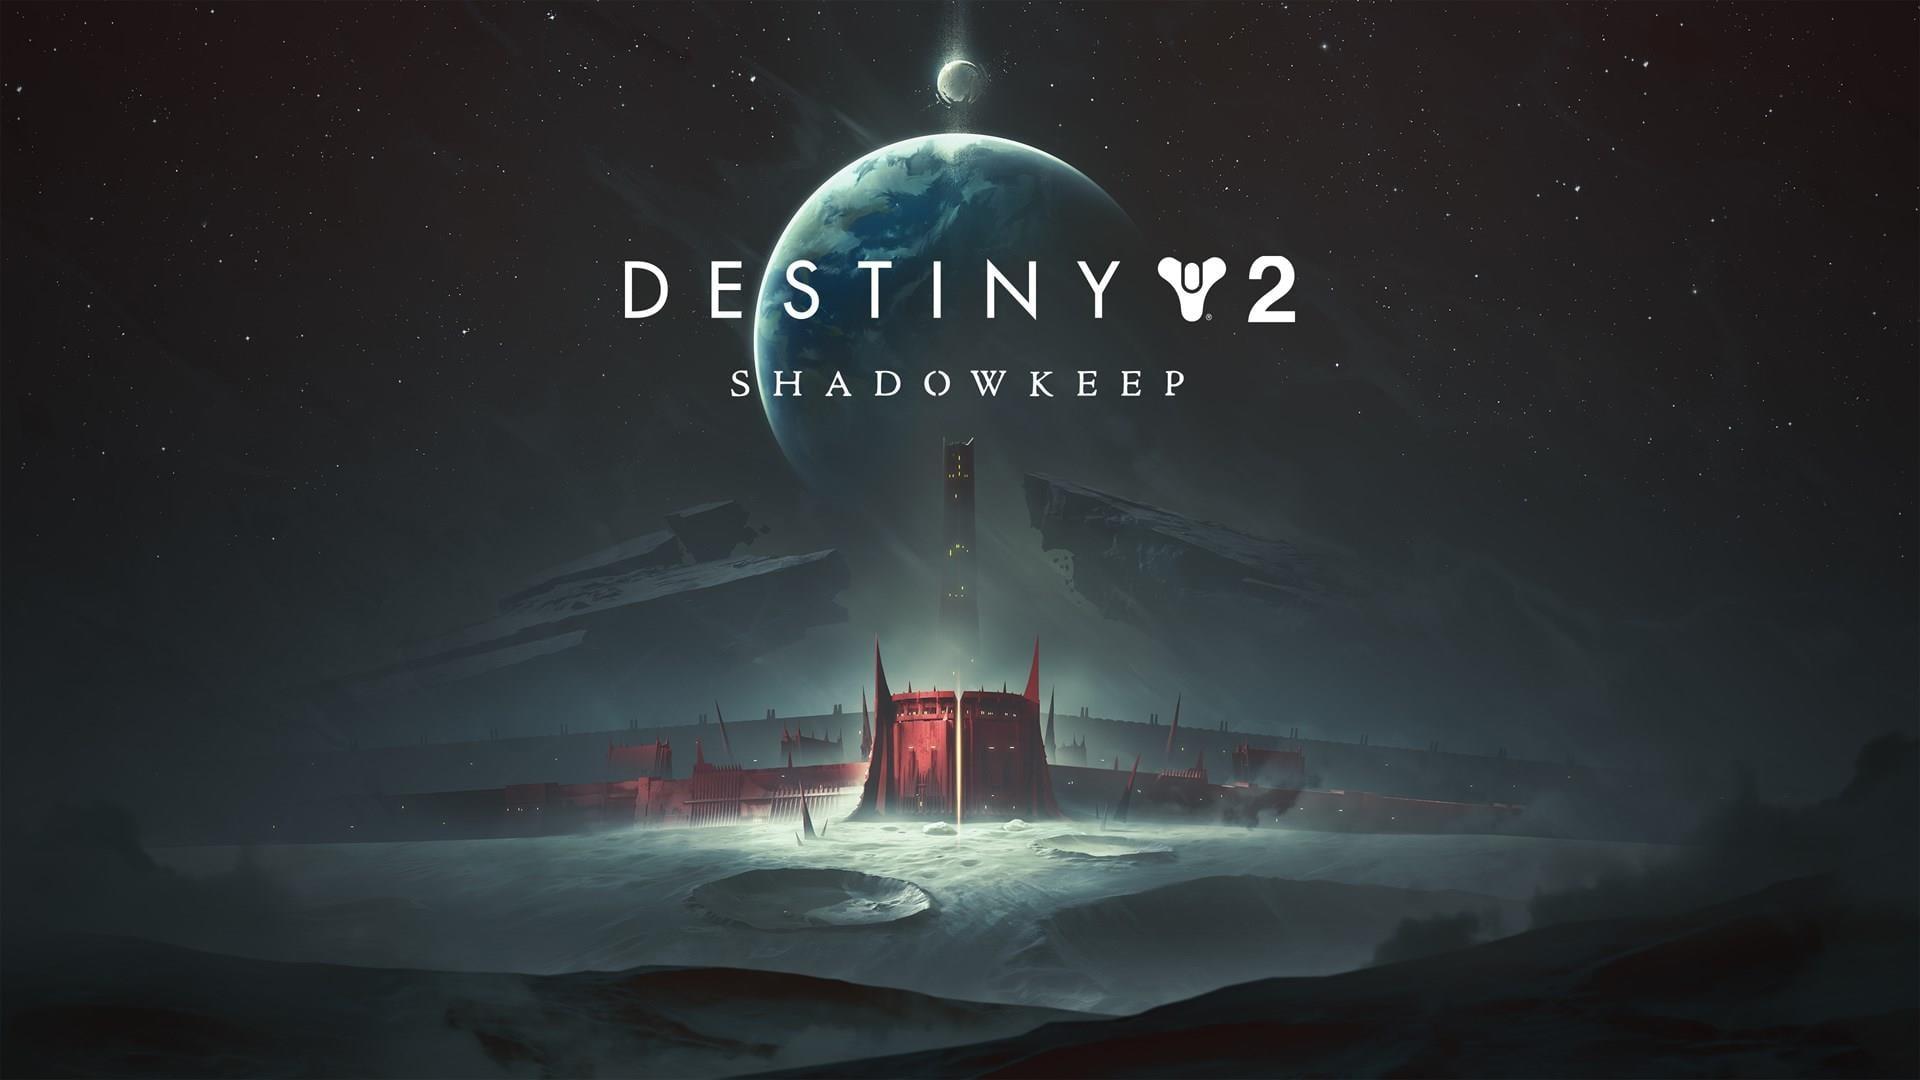 Destiny 2 Makes Eververse Changes in September